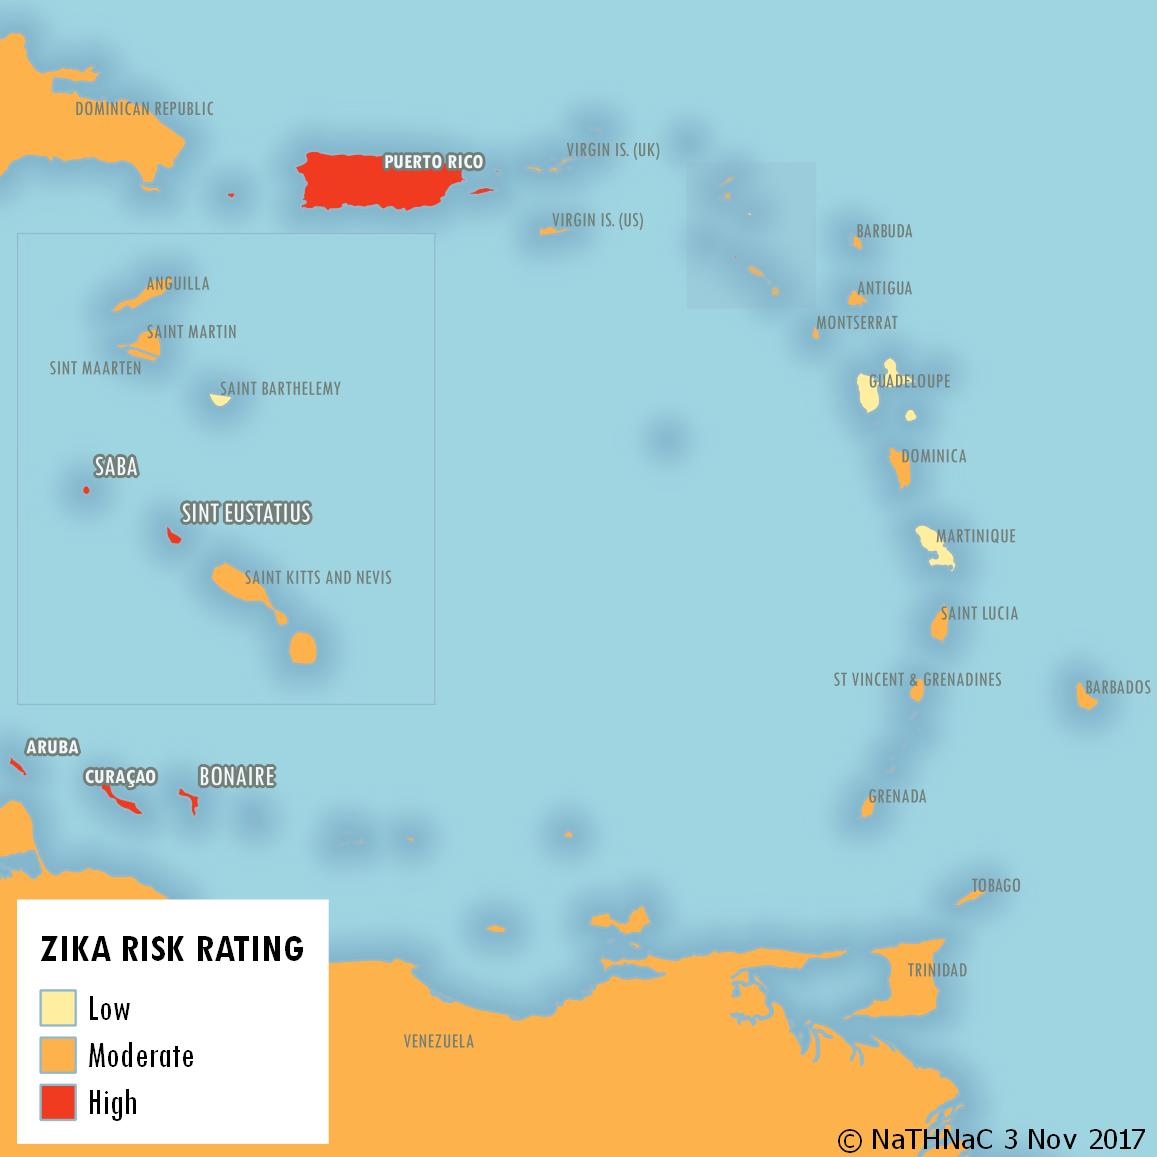 Zika Risk Caribbean Islands